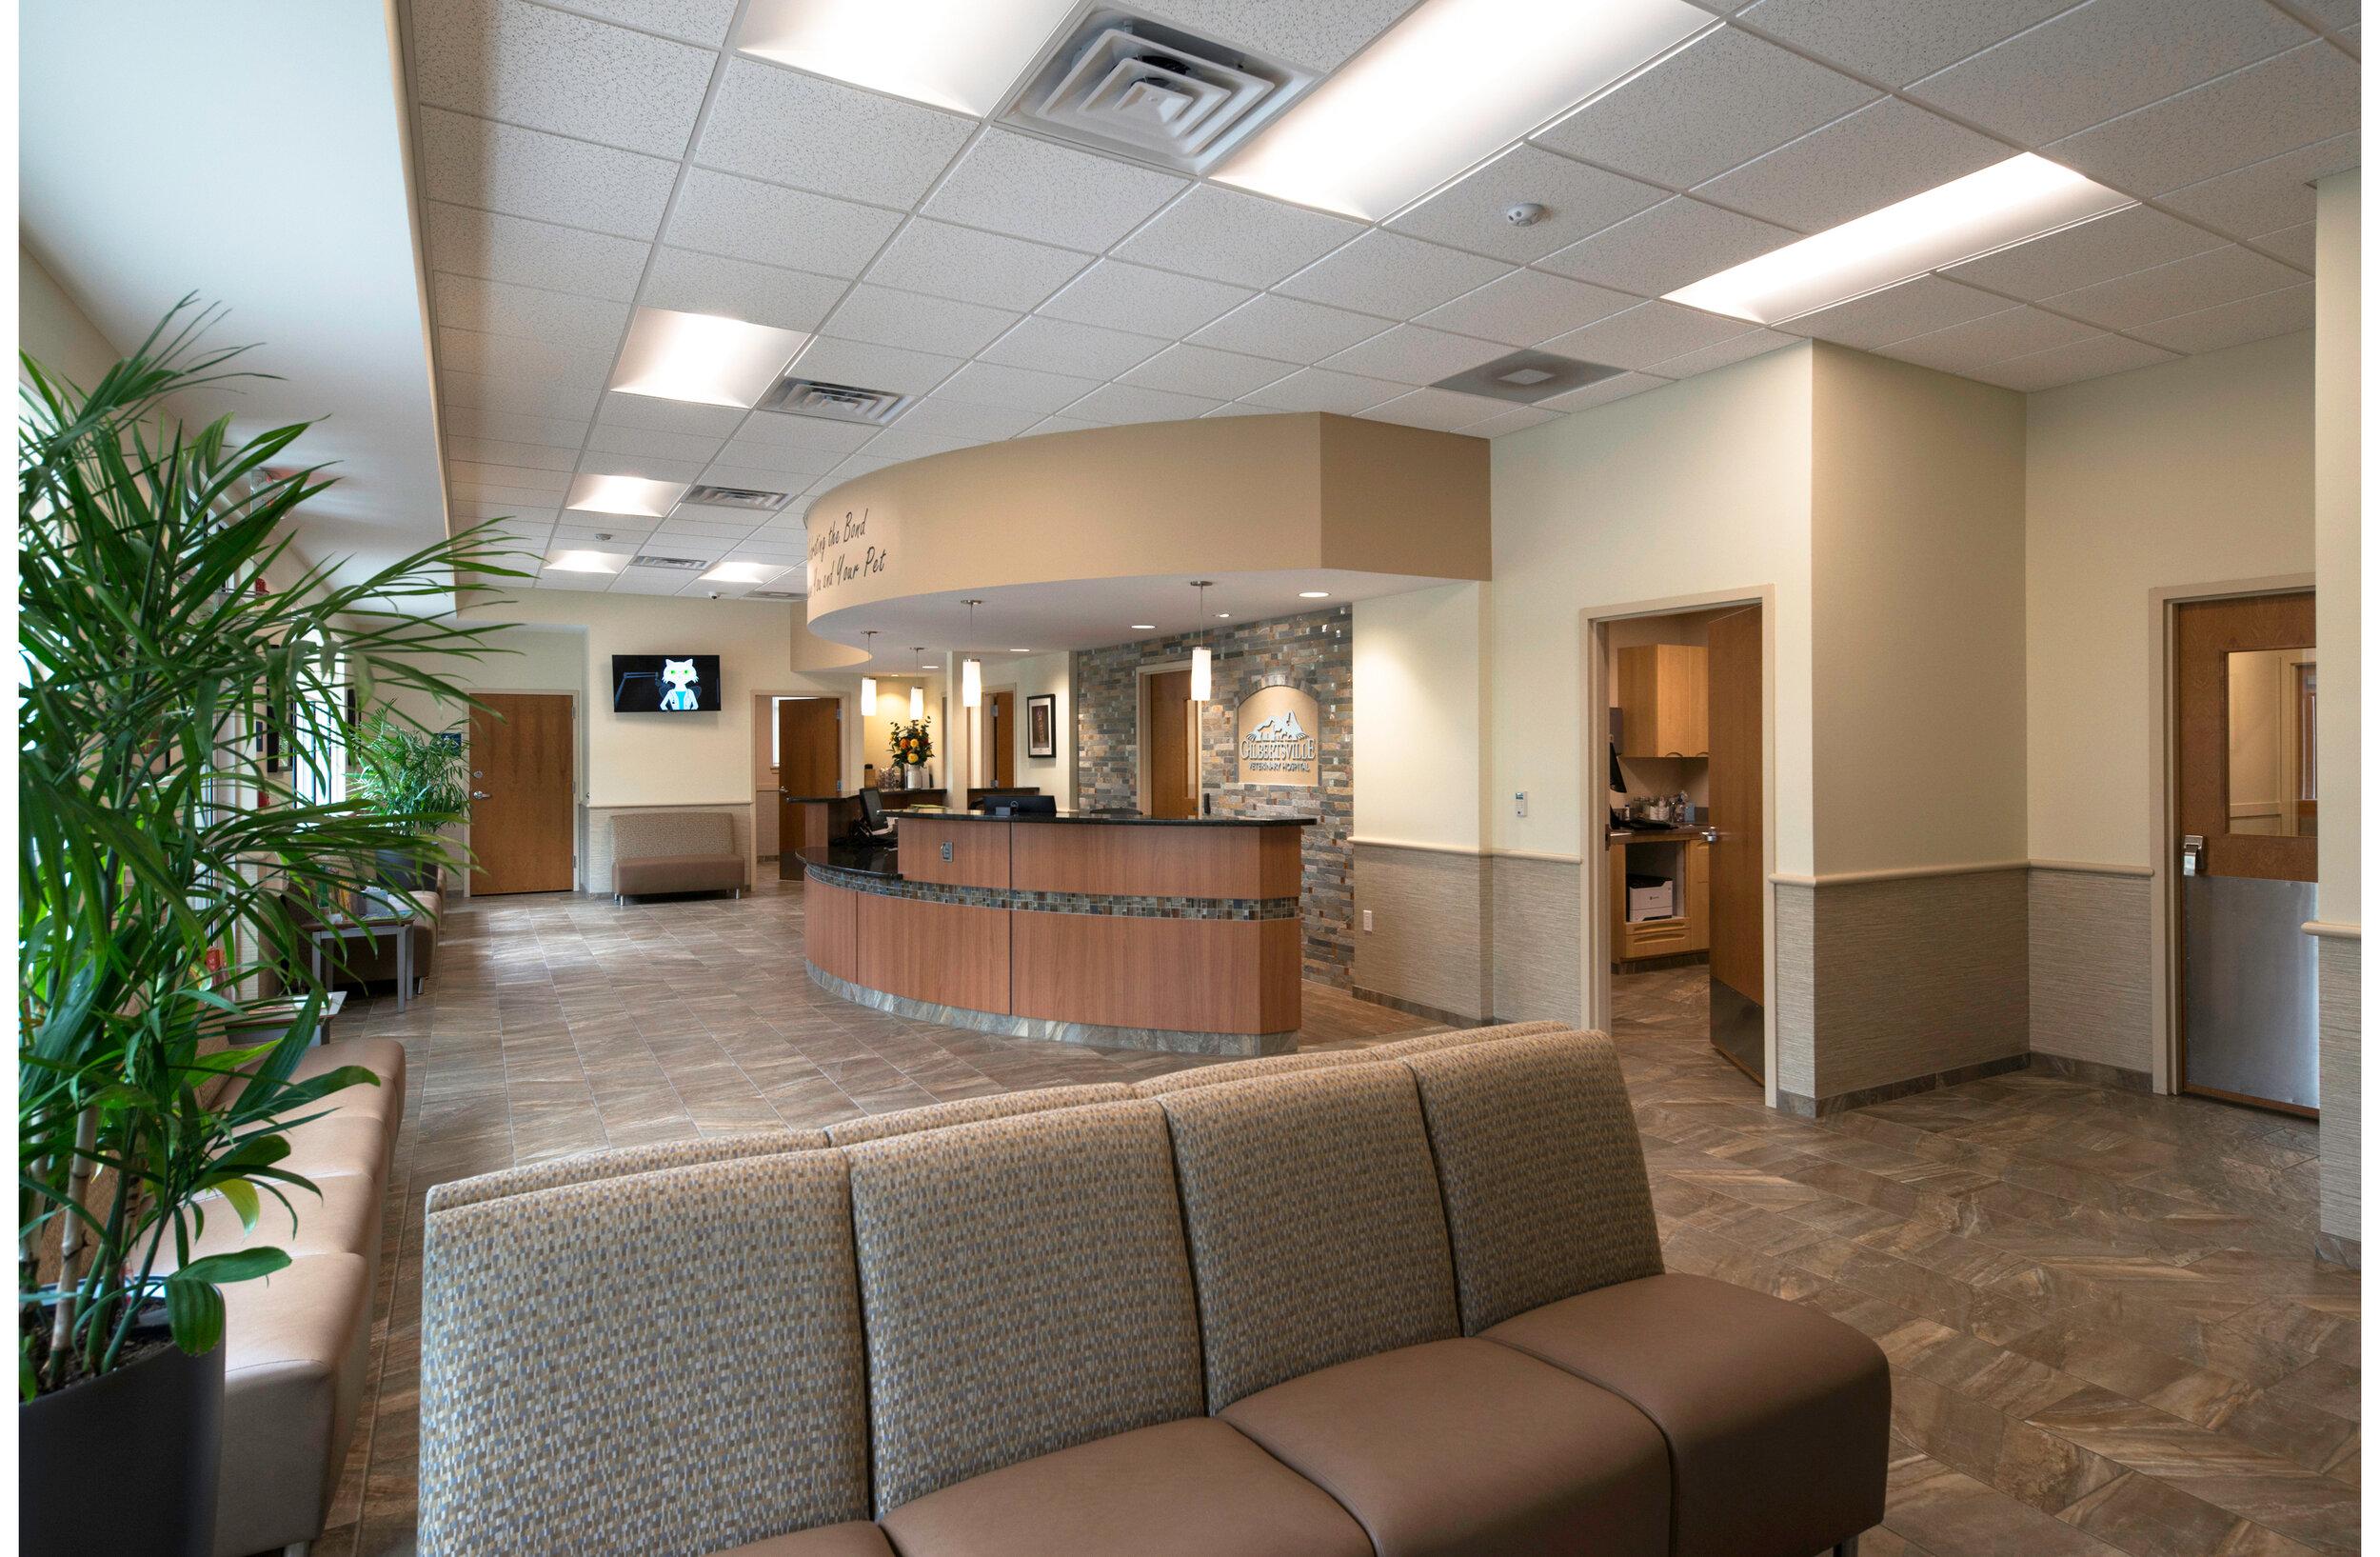 GilbertsvilleVeterinaryHospital_Waiting1.jpg